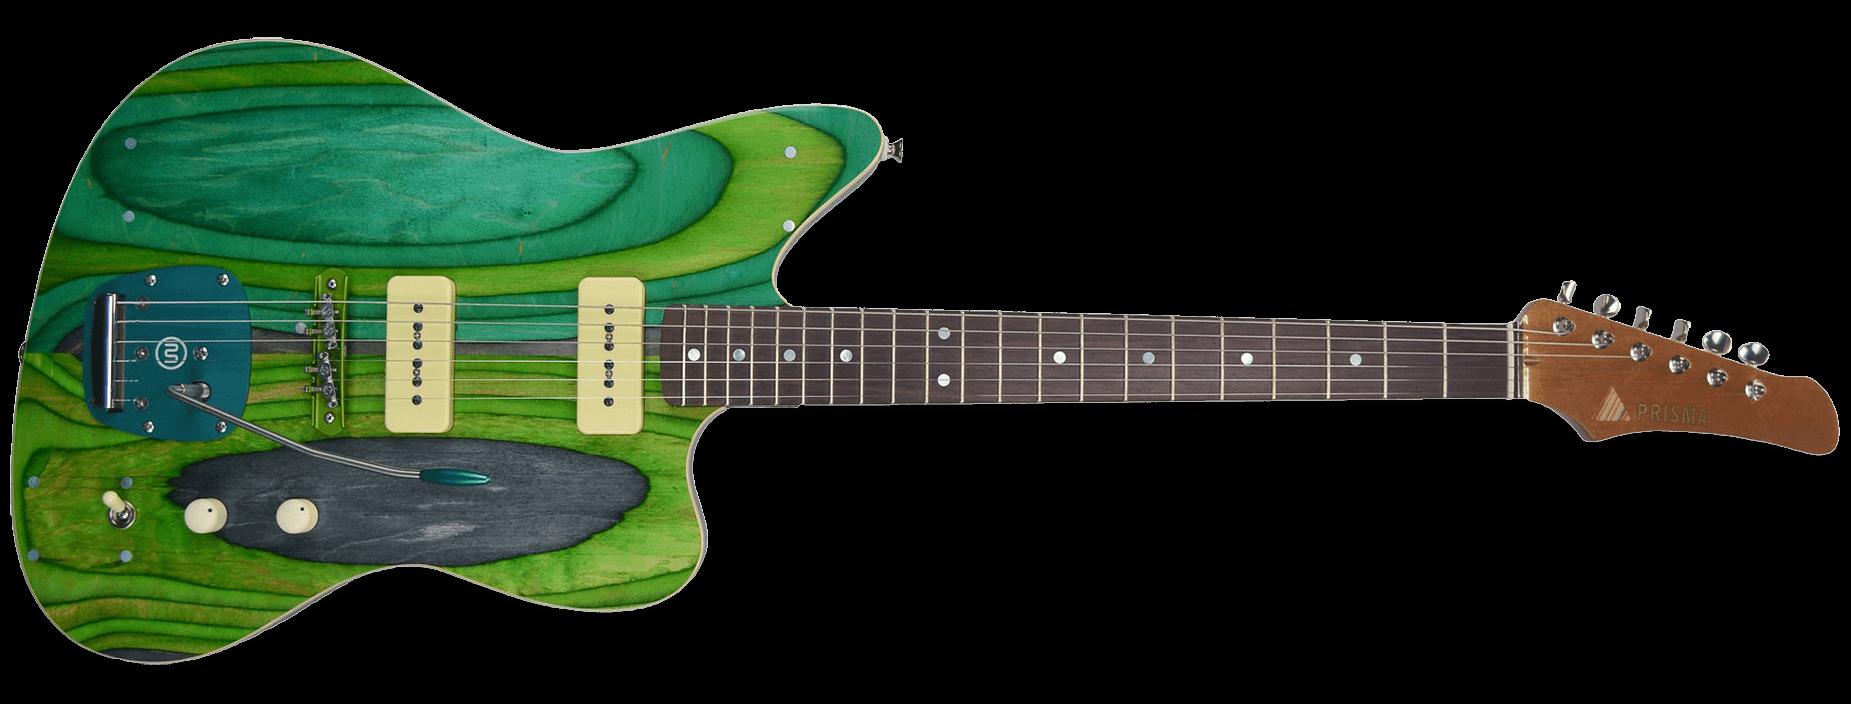 Prisma Toledo Creature Green